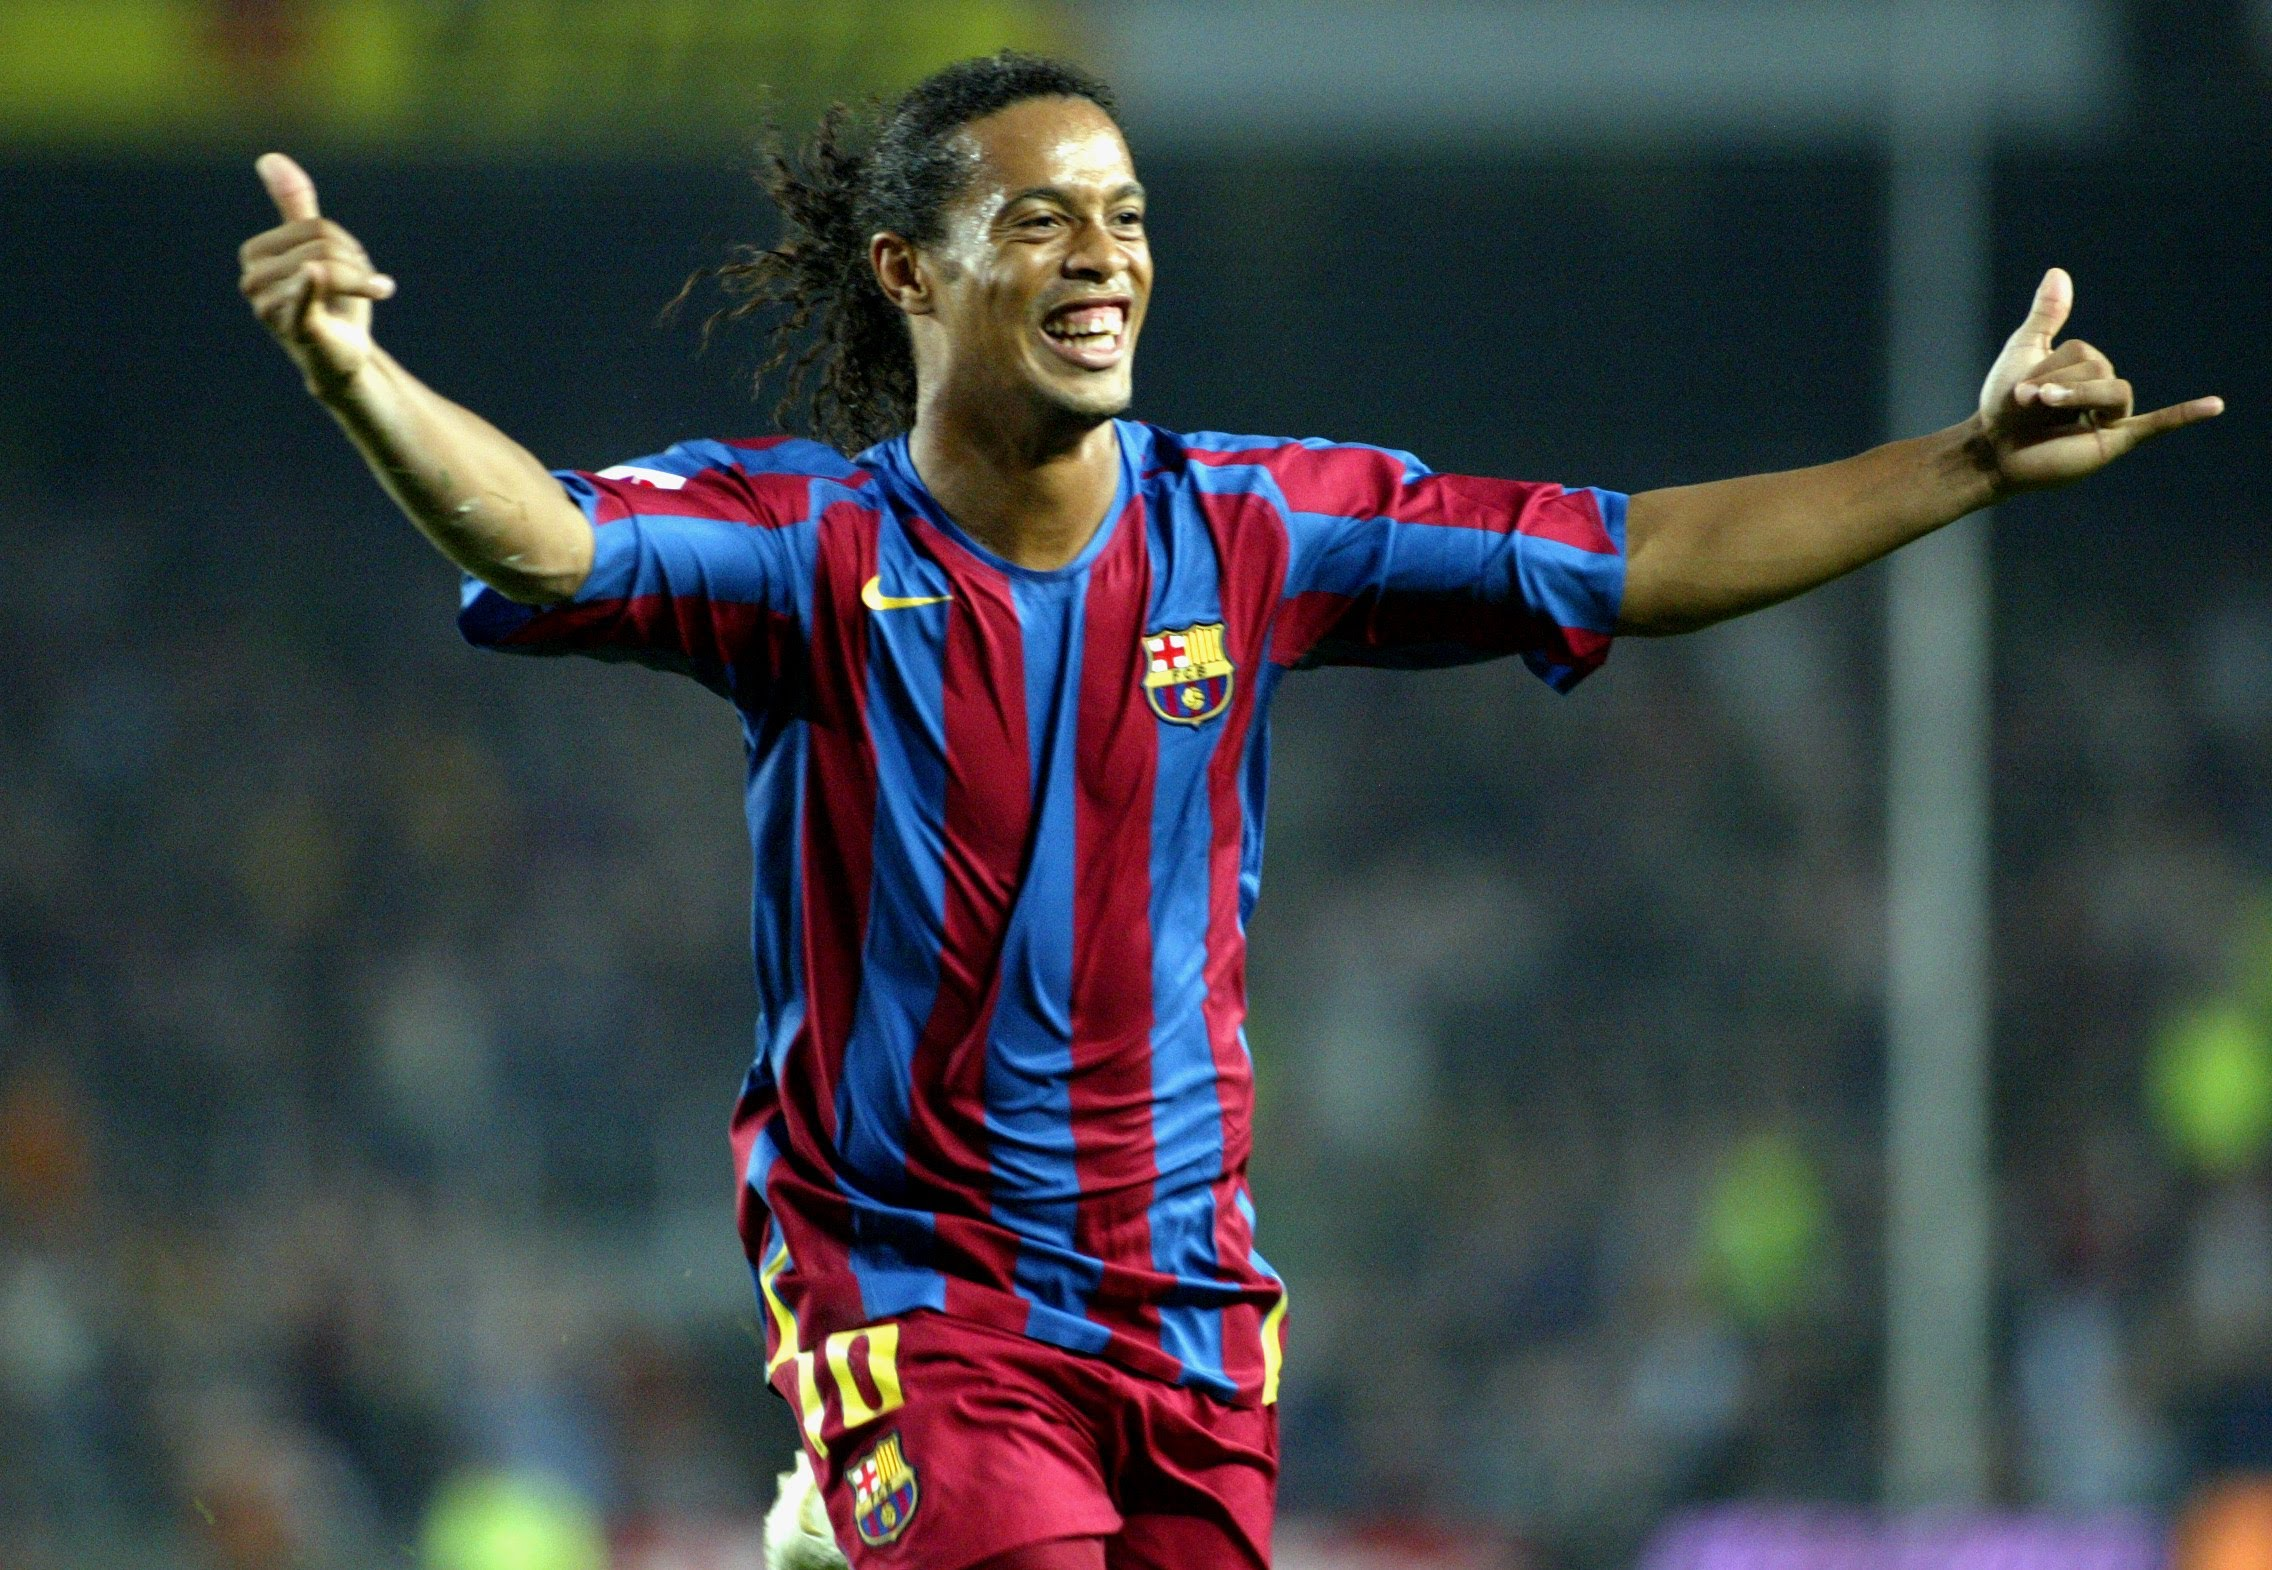 Ronaldinho Gaucho, le magicien